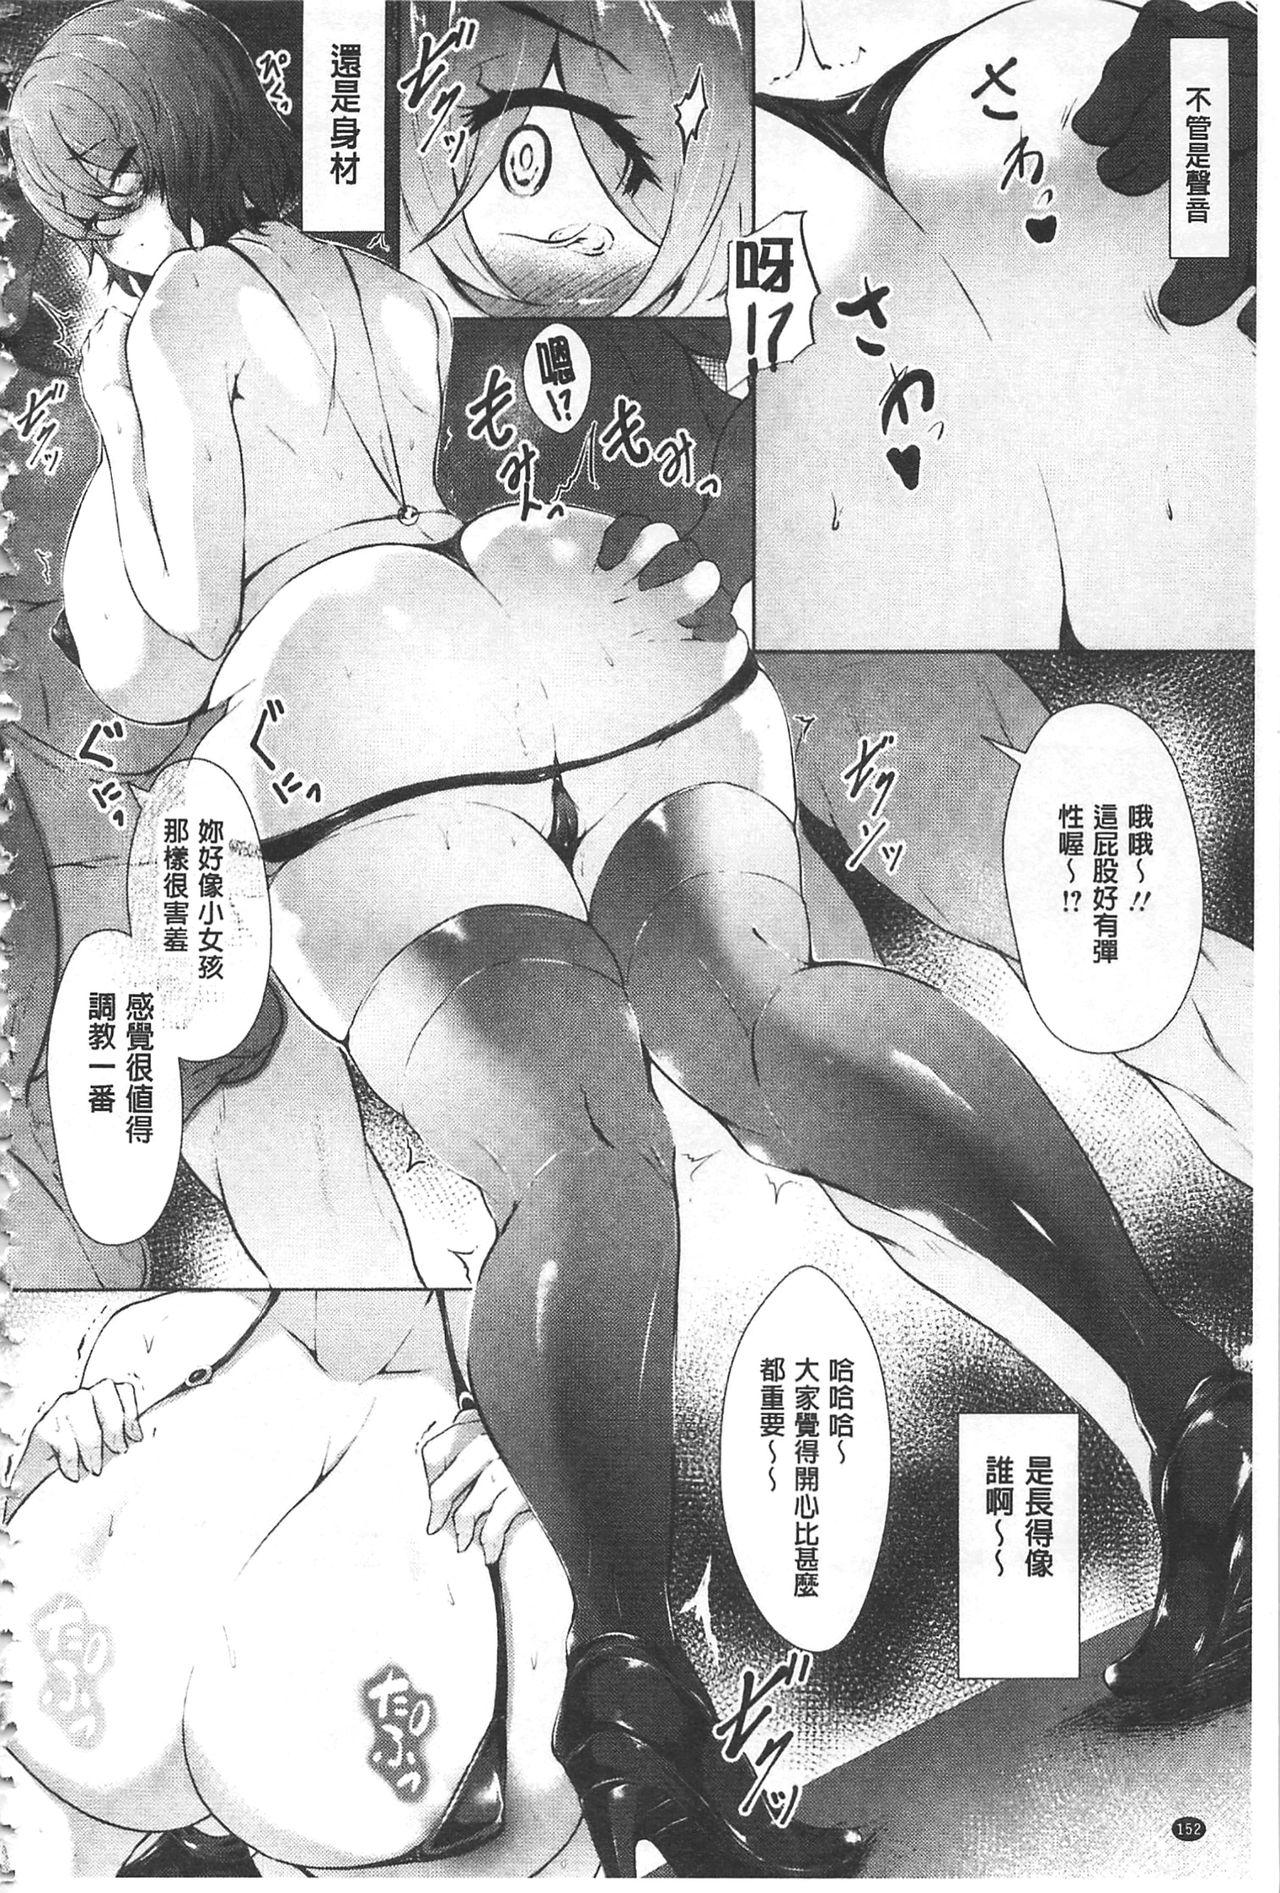 [Lorica] Biinkan Anal ~Kakusei Nejikomi Ana~ | 美淫感猥菊花 塞入擴張覺醒穴 [Chinese] 152